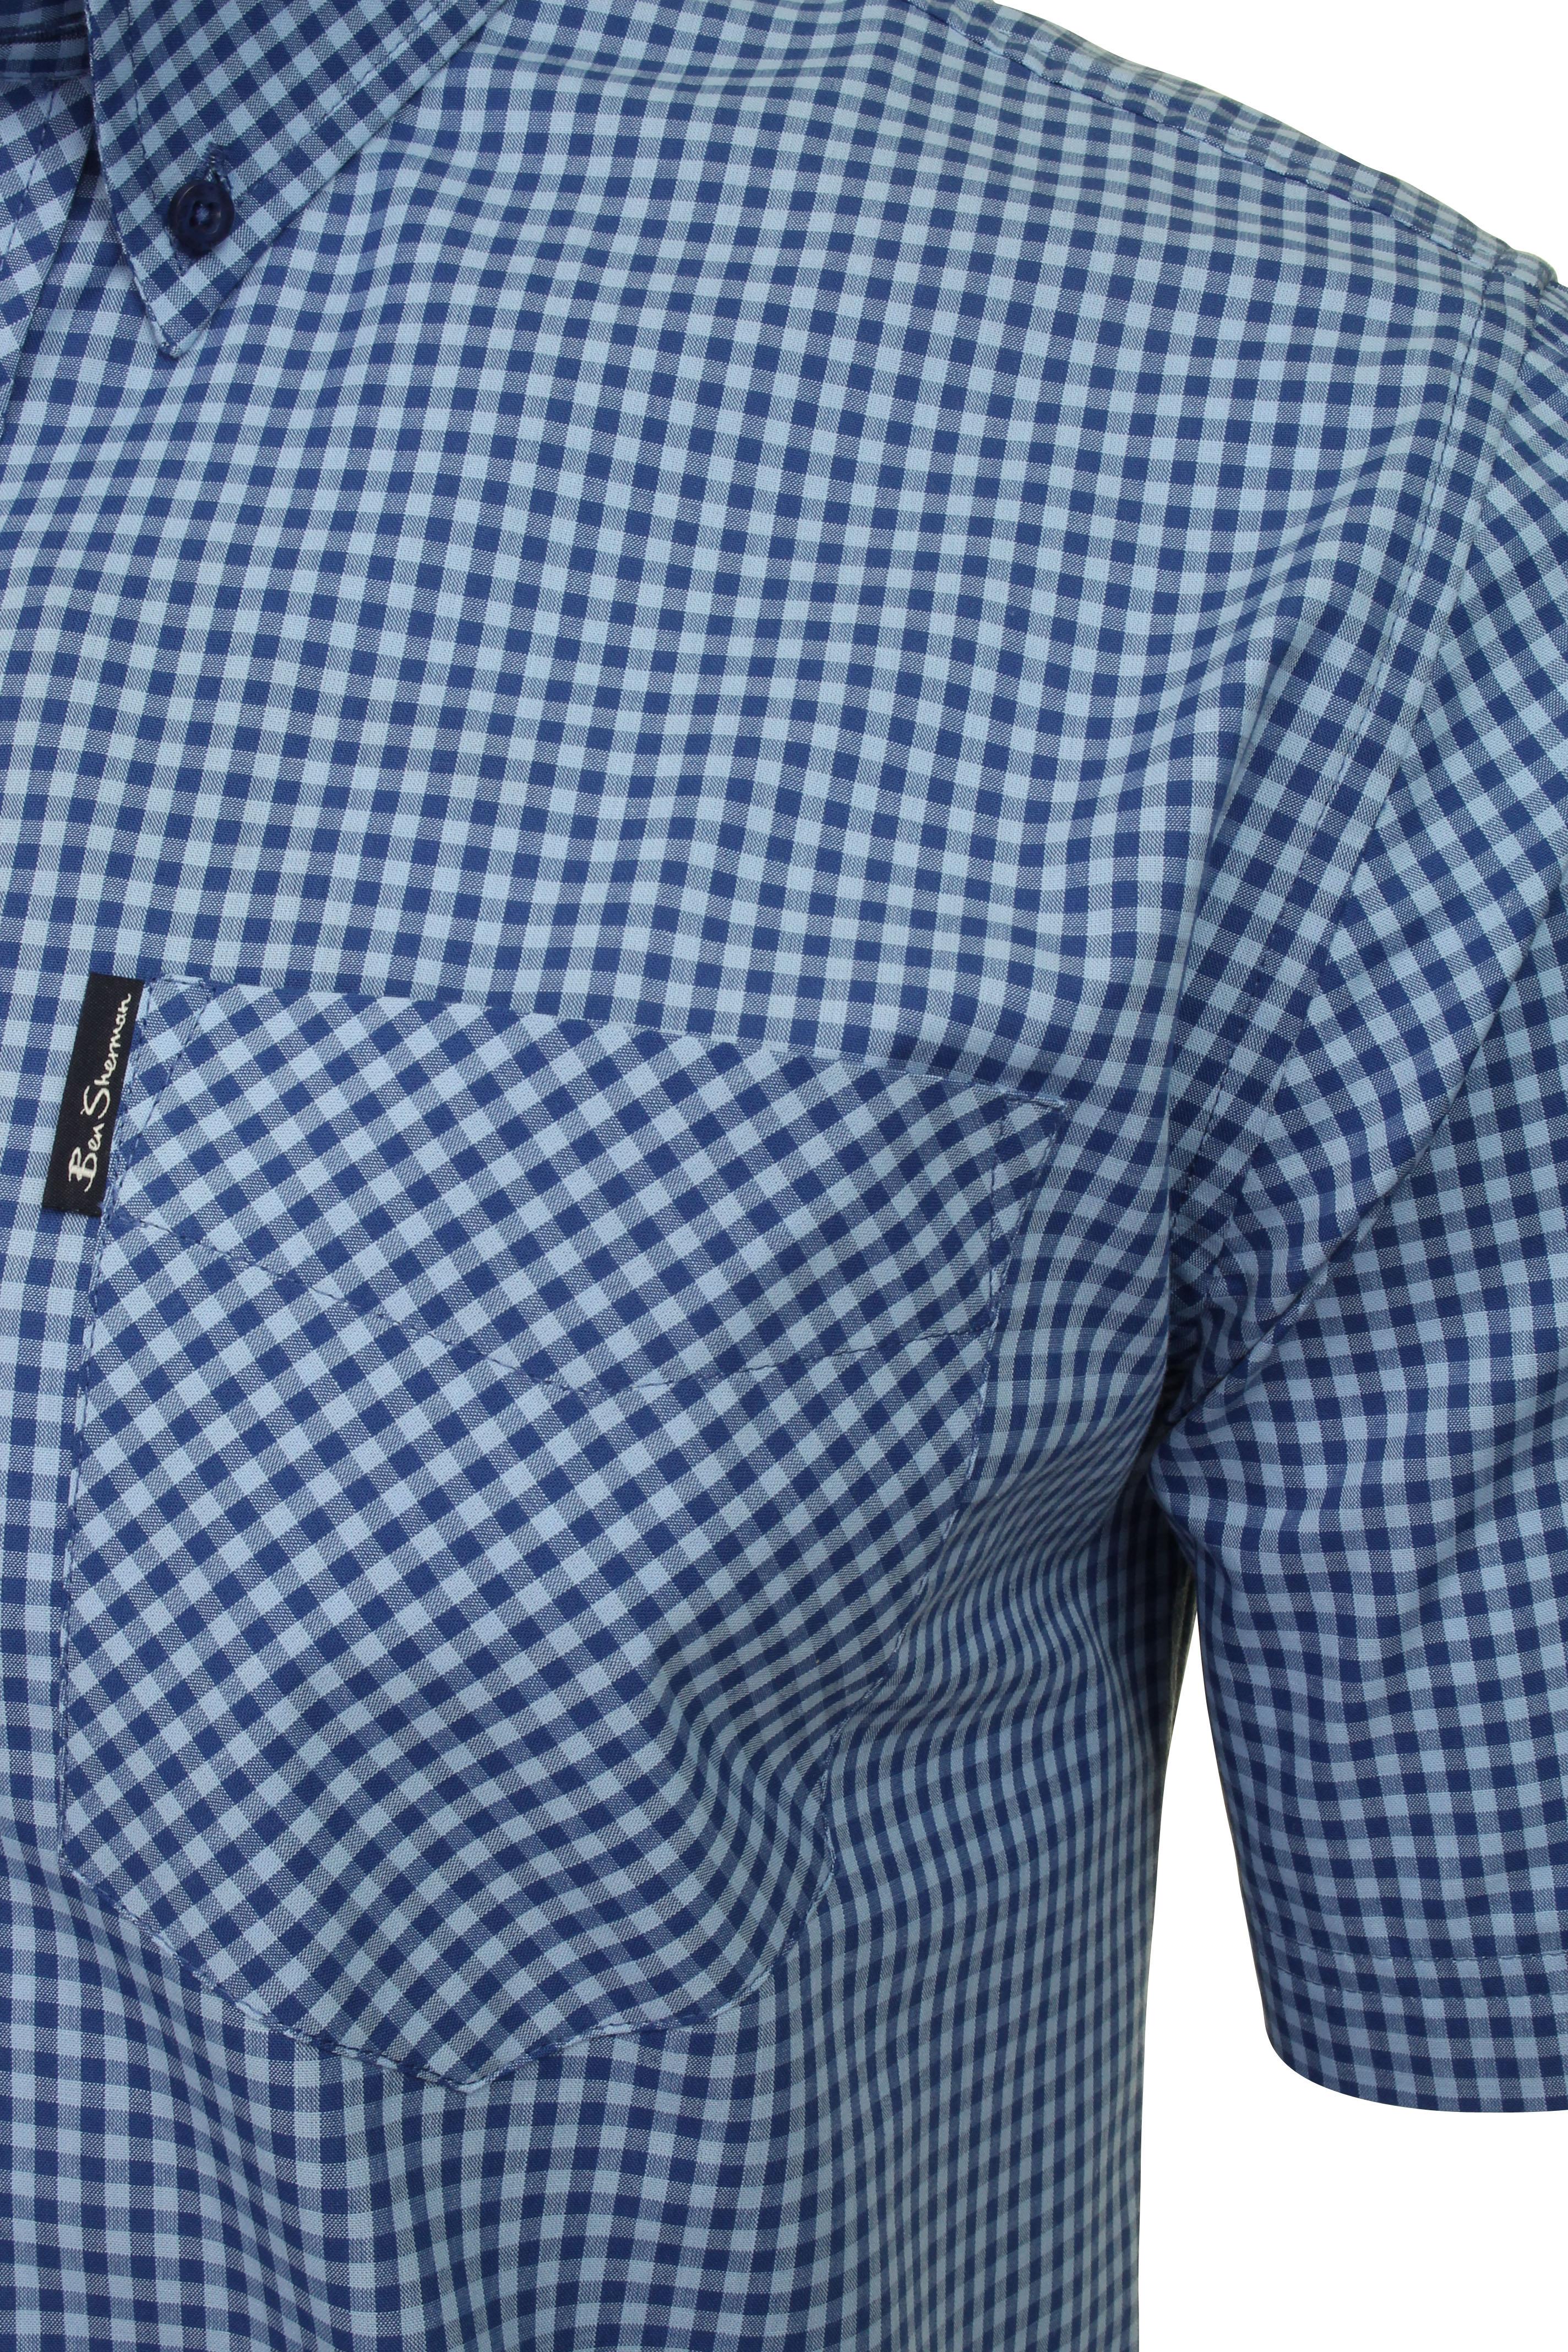 Ben Sherman Mens Short Sleeved Gingham Check Shirt